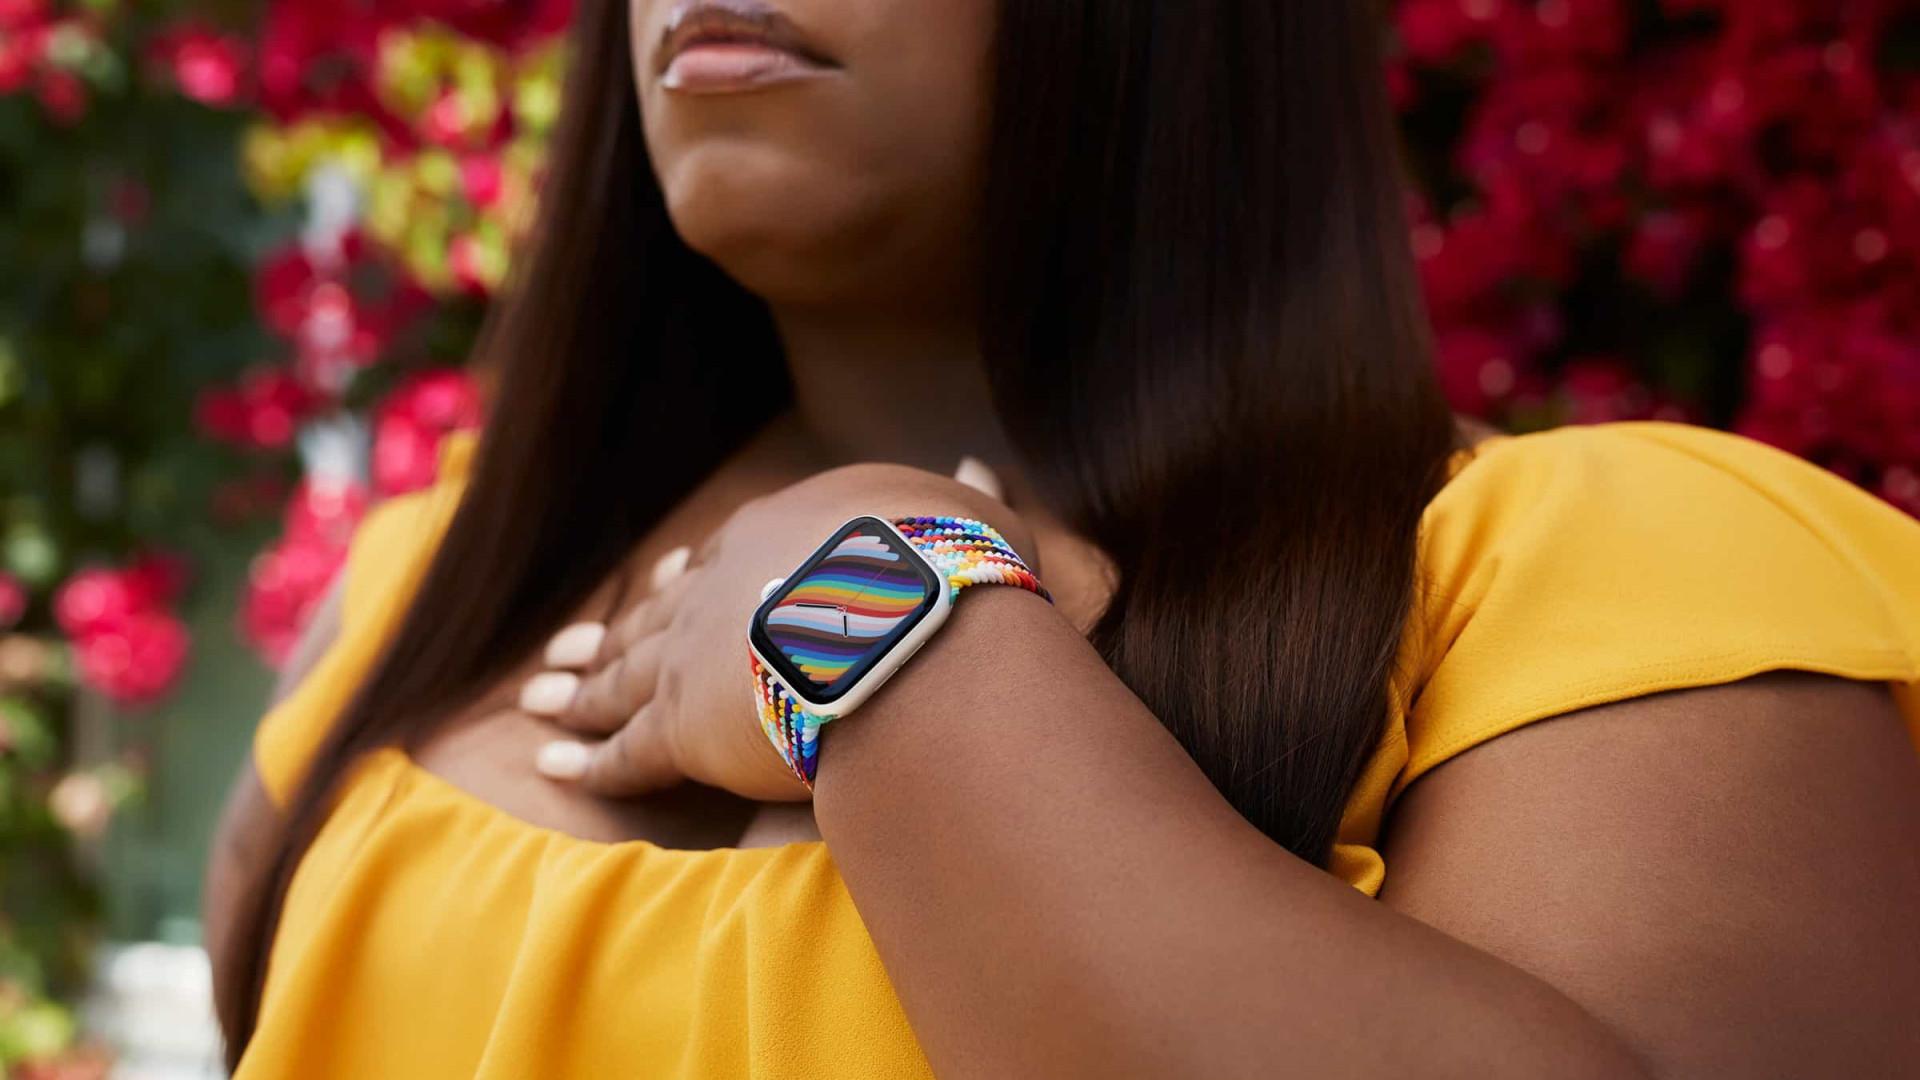 Apple Watch recebe novas braceletes para celebrar comunidade LGBT